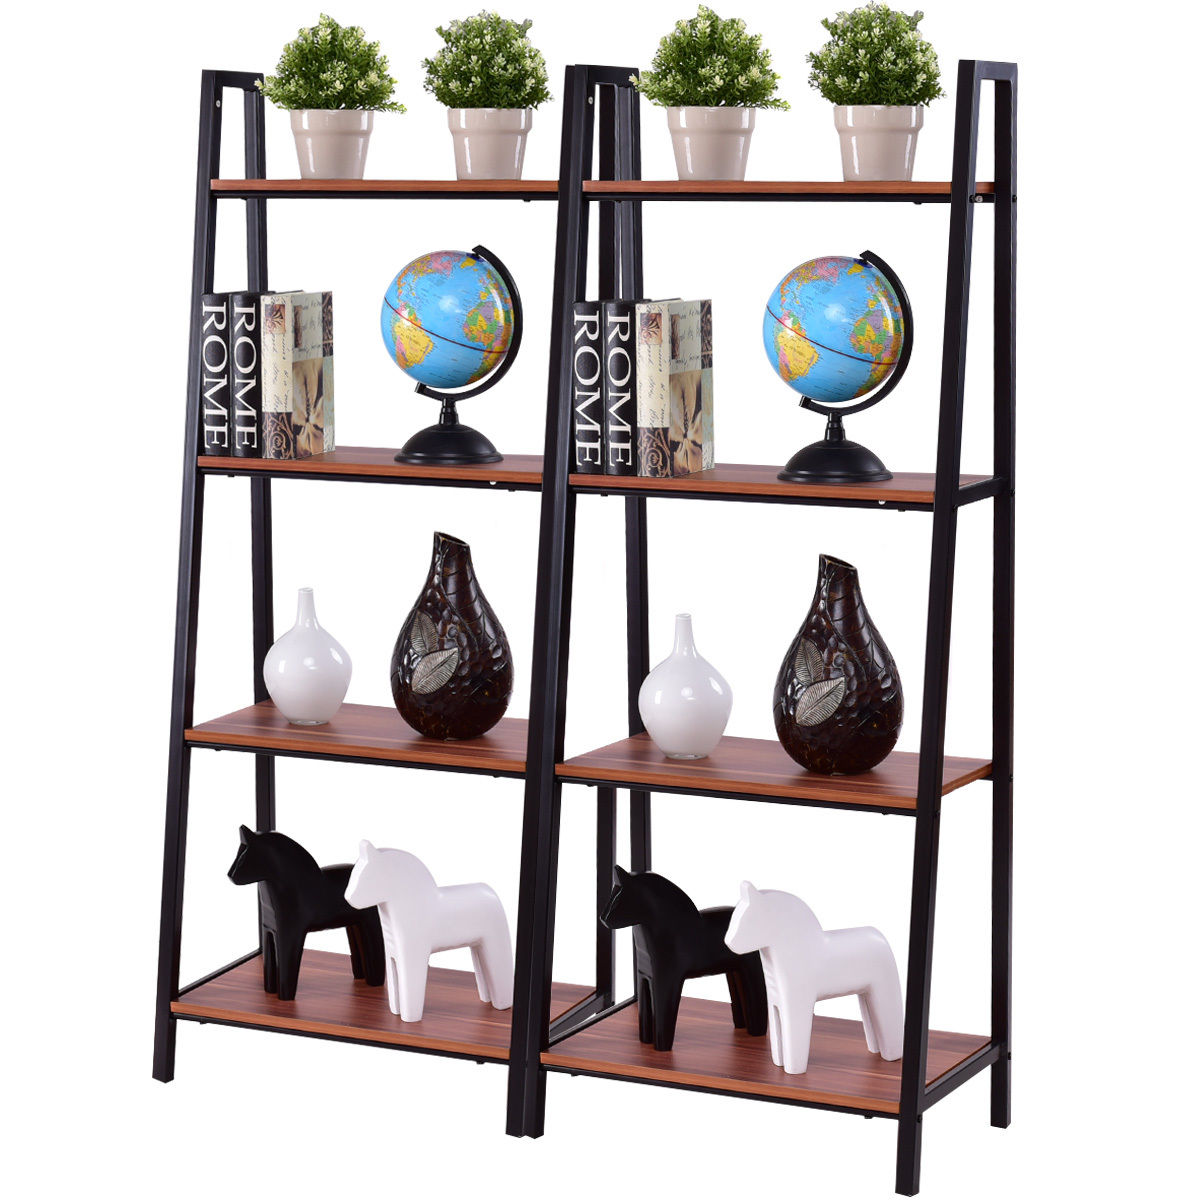 Us 105 99 Giantex 2pcs 4 Tier Ladder Storage Bookshelf Living Room Wall Bookcase Bundle Modern Ladder Shelf Home Furniture Hw55458 On Aliexpress